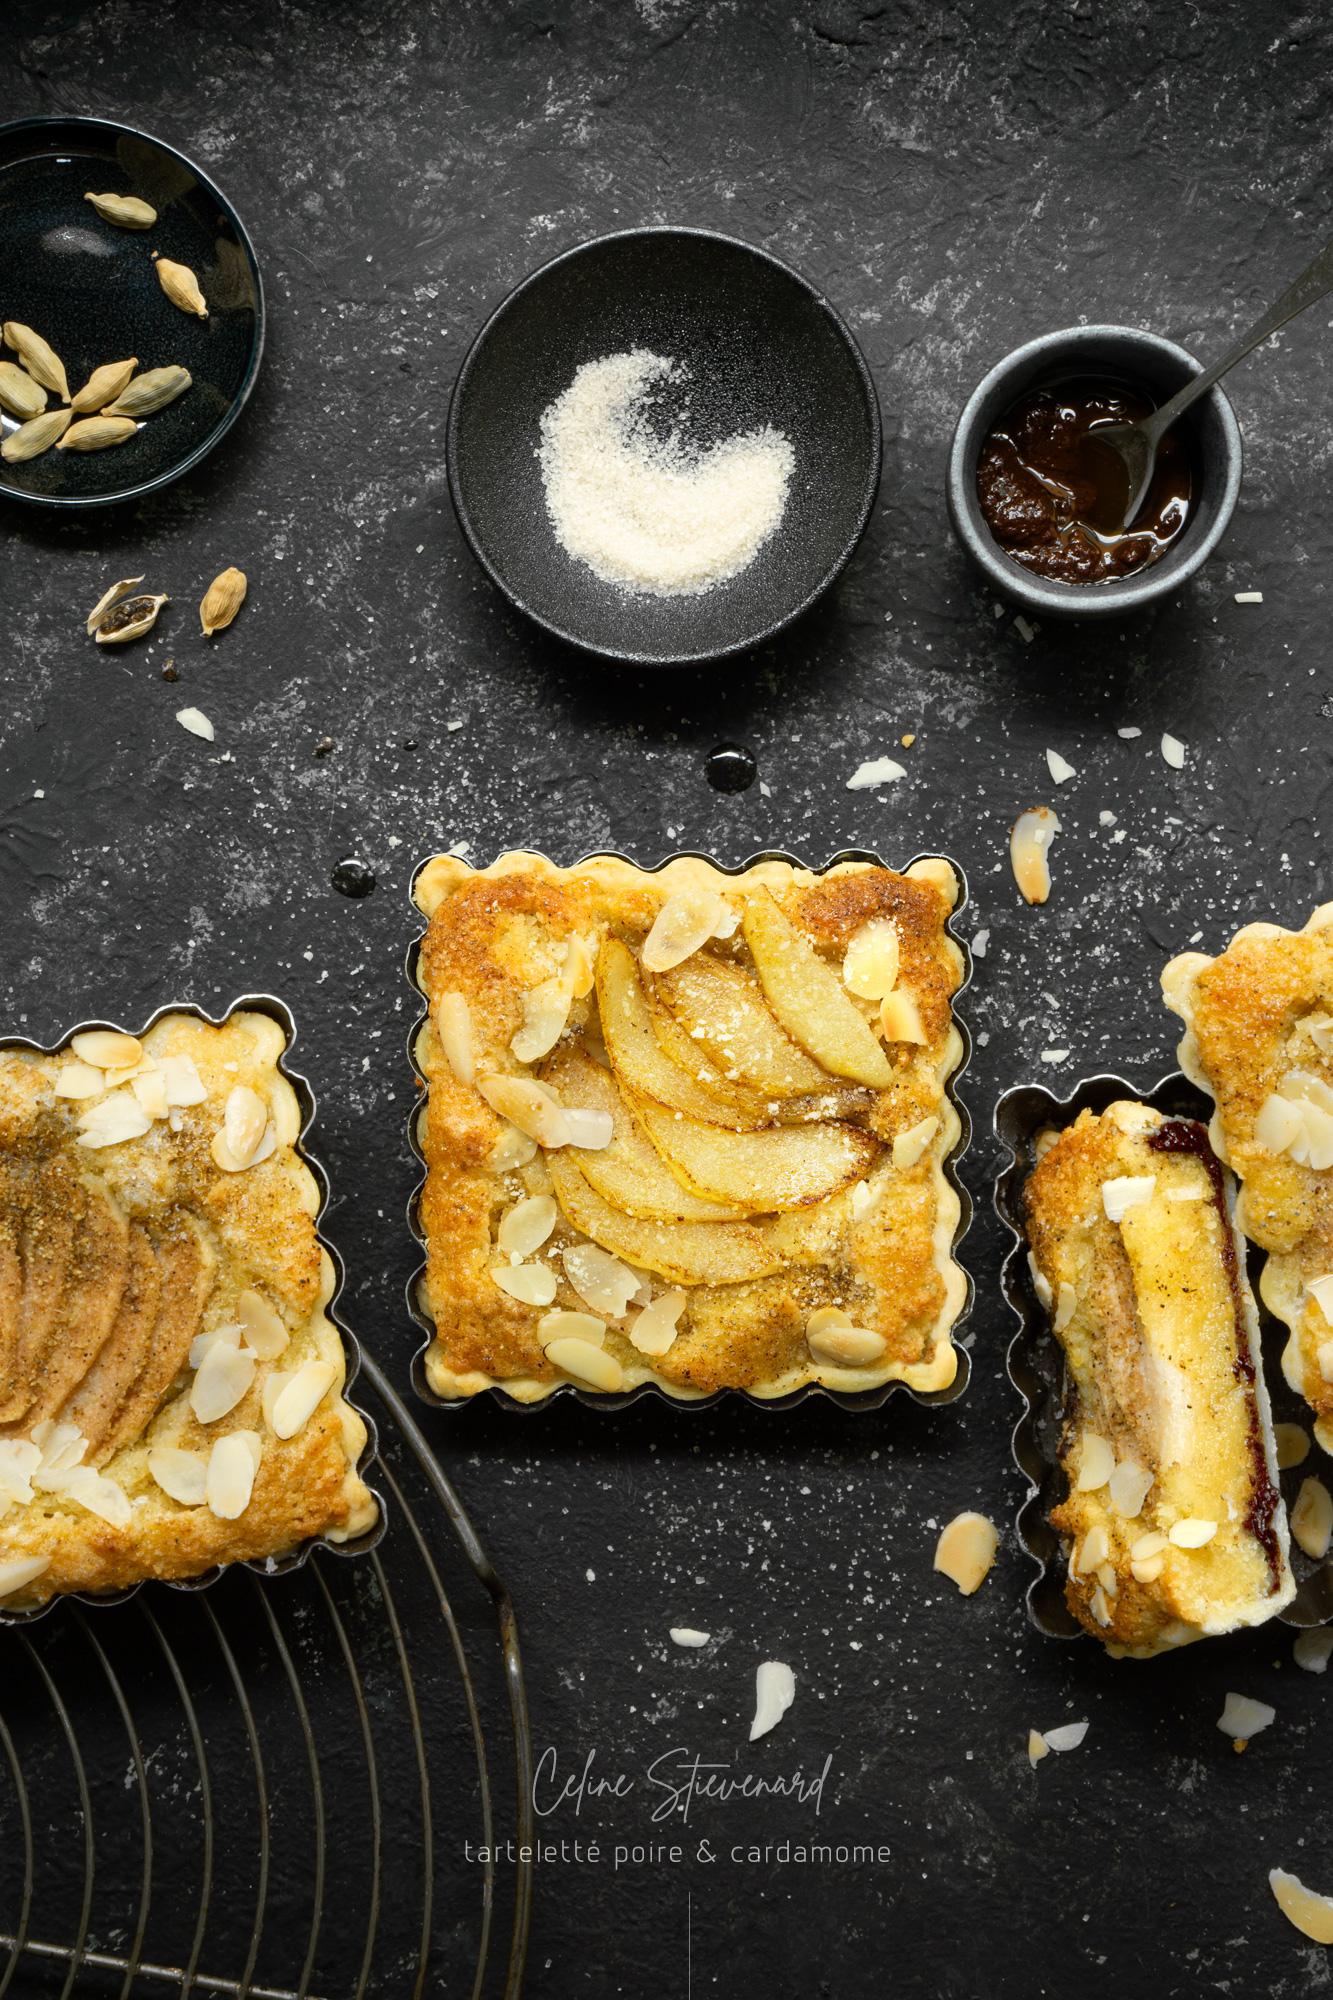 céline Stiévenard - food photo - photo et styliste culinaire - tartelette-poire cardamome amande chocolat